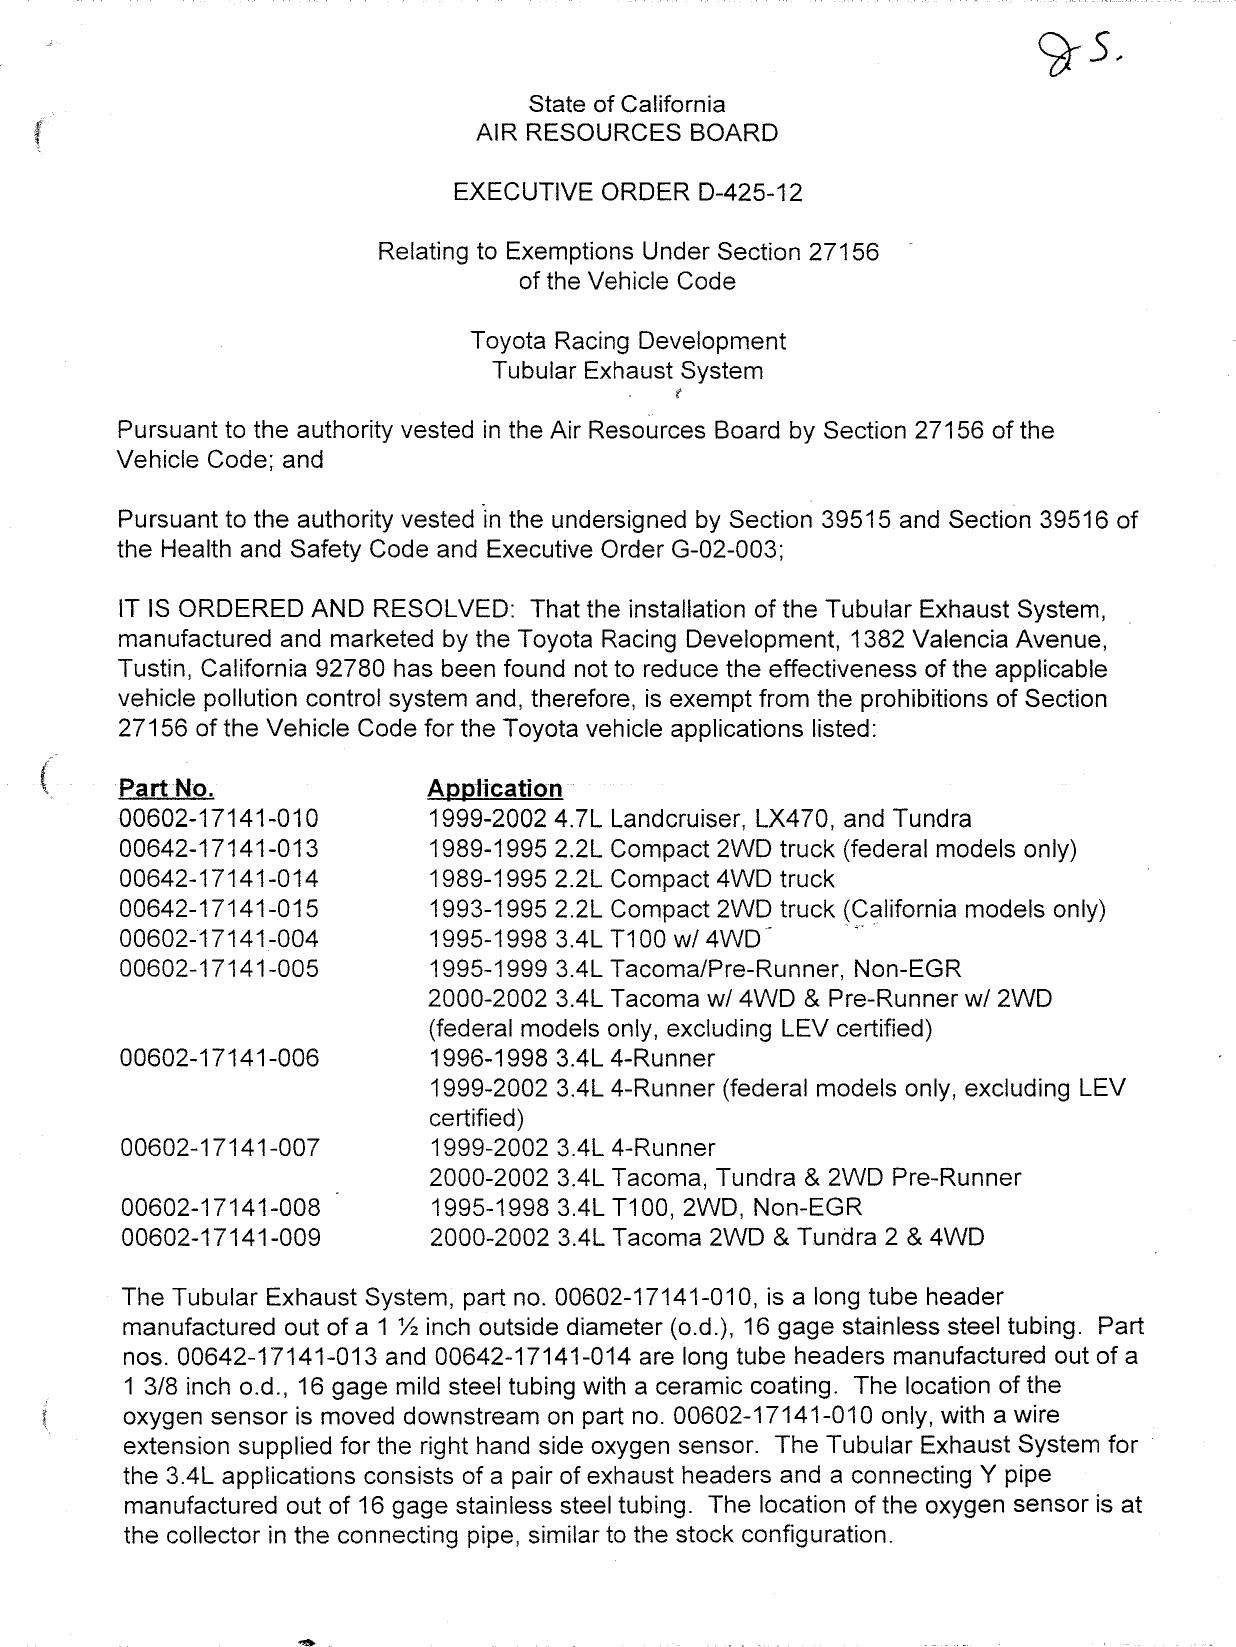 Executive Order D-425-12 Toyota Racing Development